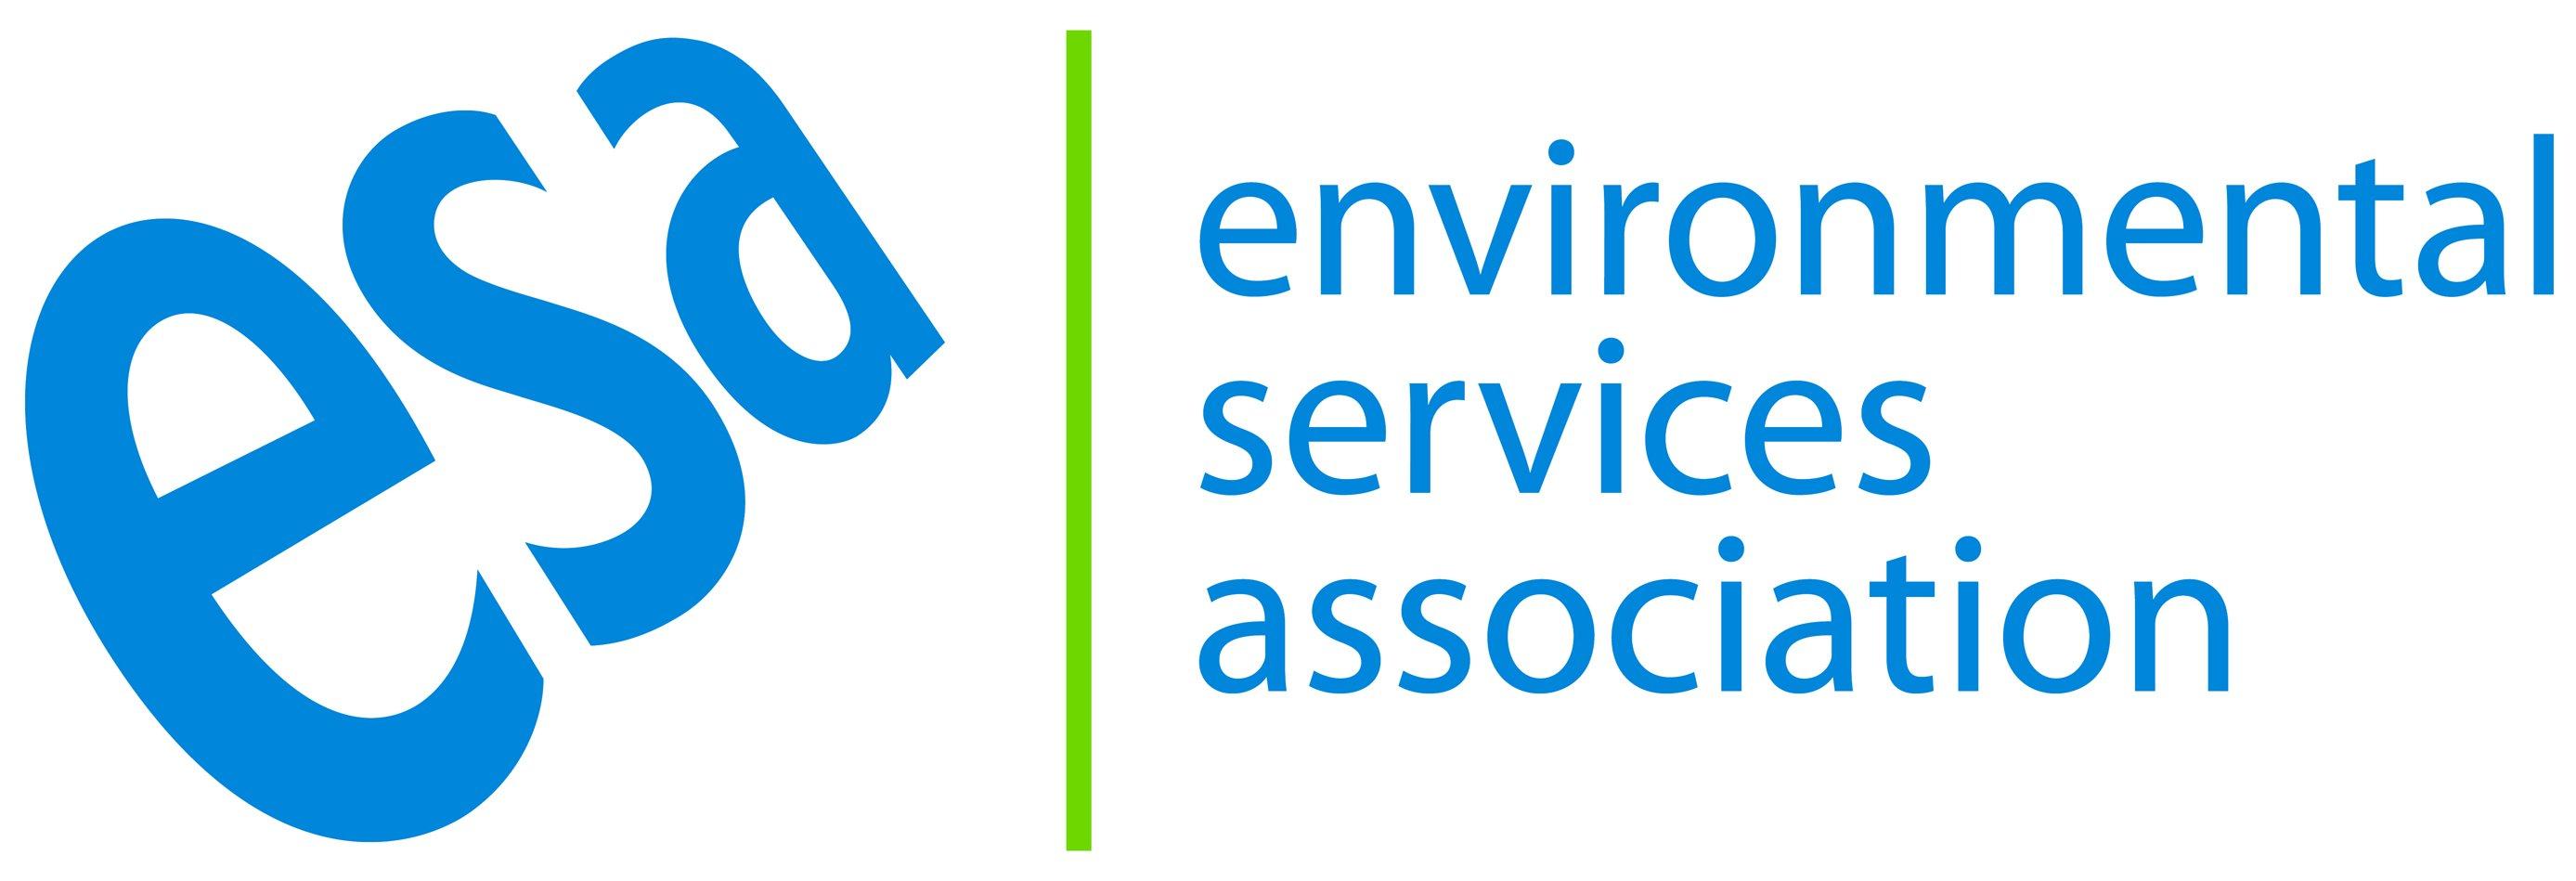 Environmental Services Association